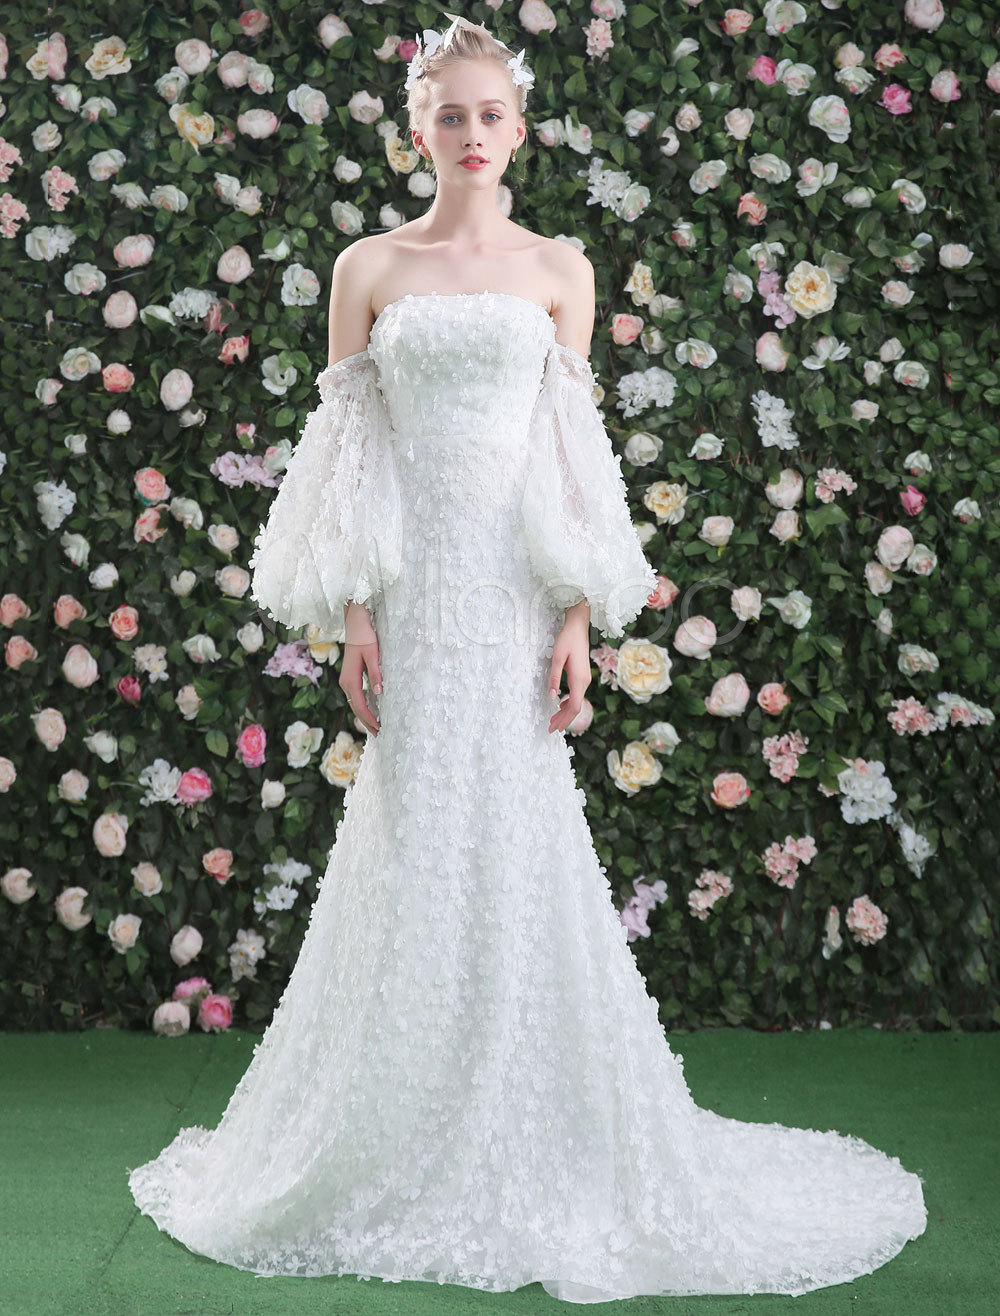 Lace Wedding Dresses Flowers Boho Balloon Sleeve Strapless White ...